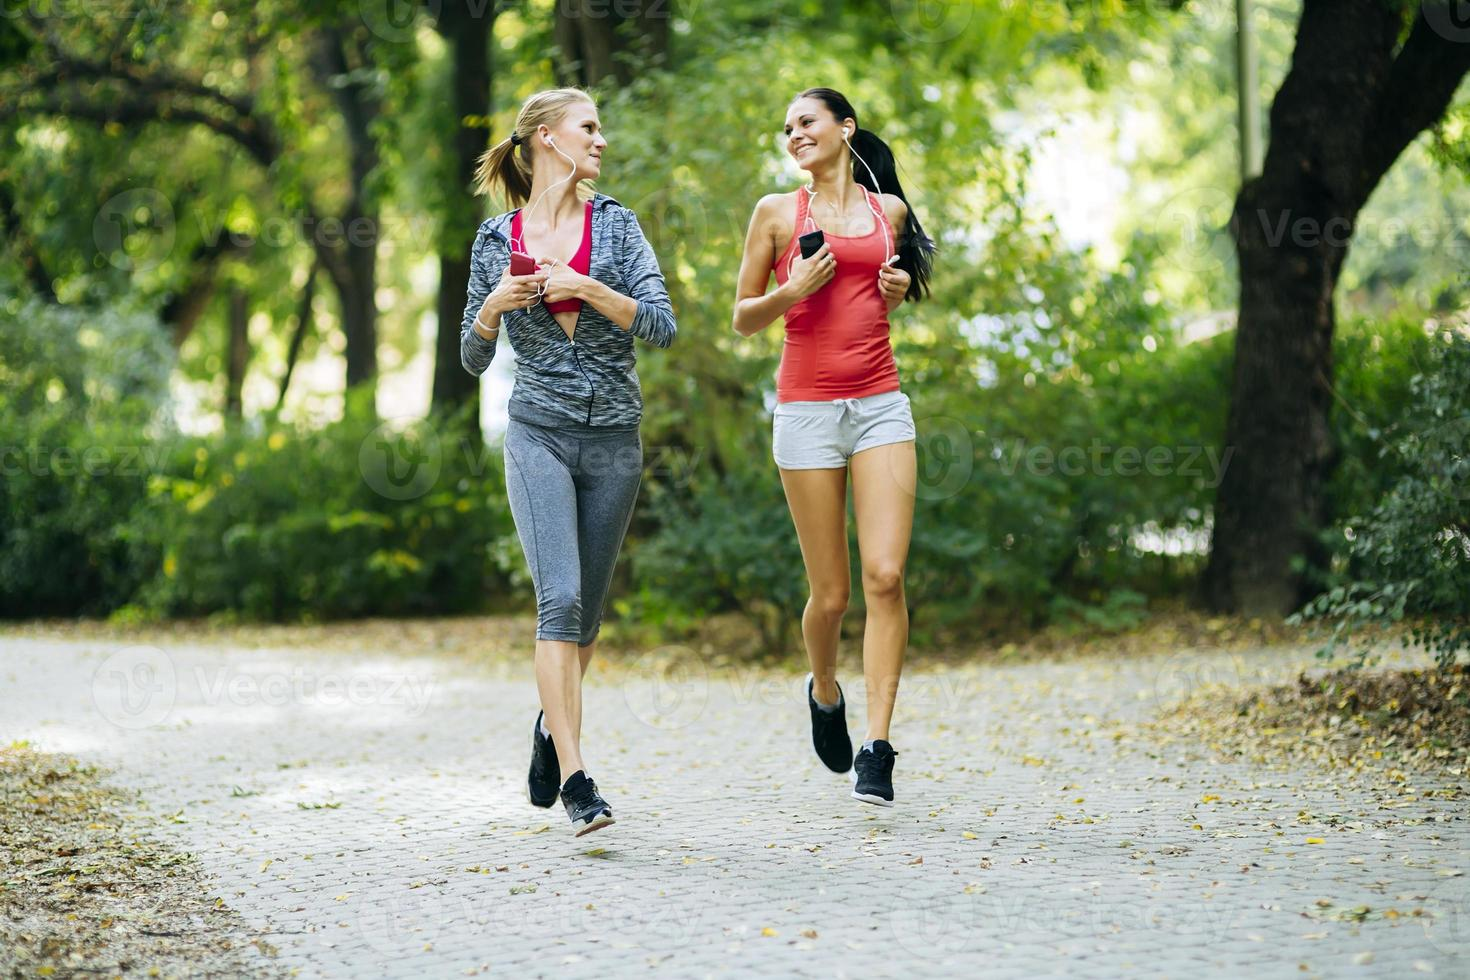 mulheres esportivas correndo no parque foto